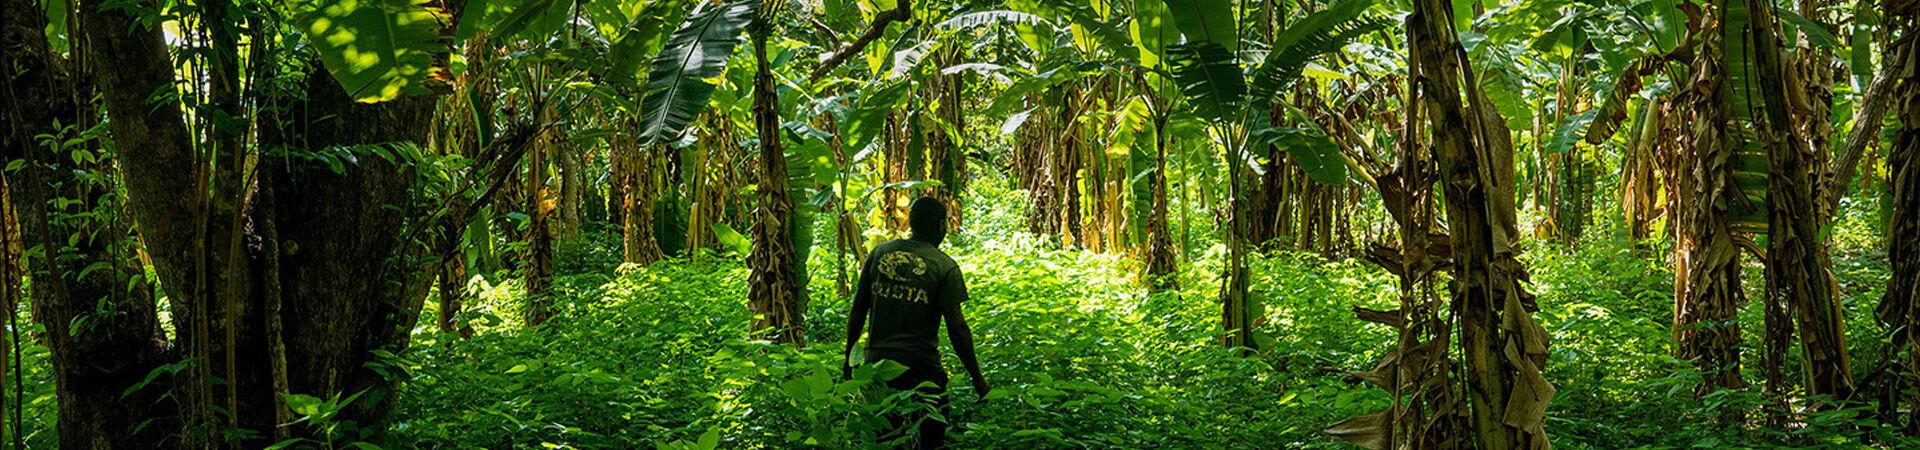 Banner - Cultivating Flourishing Ecosystems in Uganda